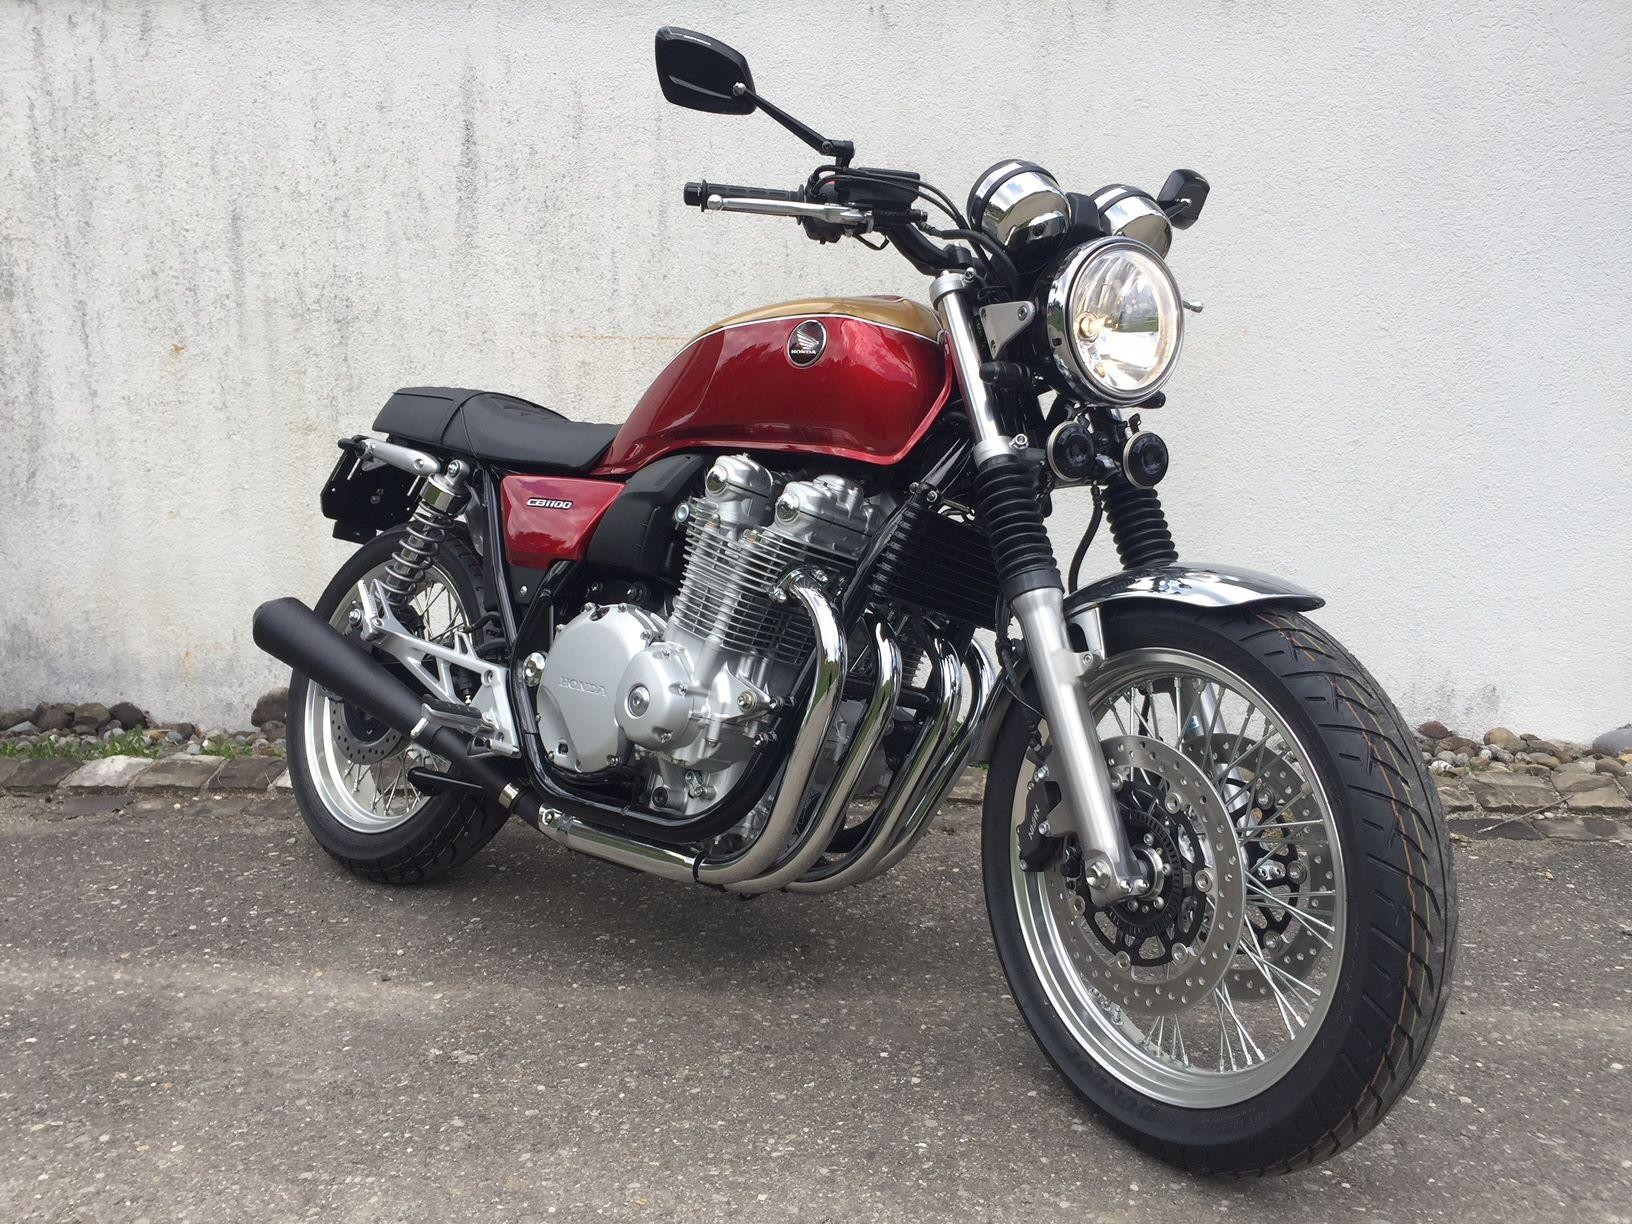 moto occasions acheter honda cb 1100 sa honda keller gmbh bauma id 7530691. Black Bedroom Furniture Sets. Home Design Ideas